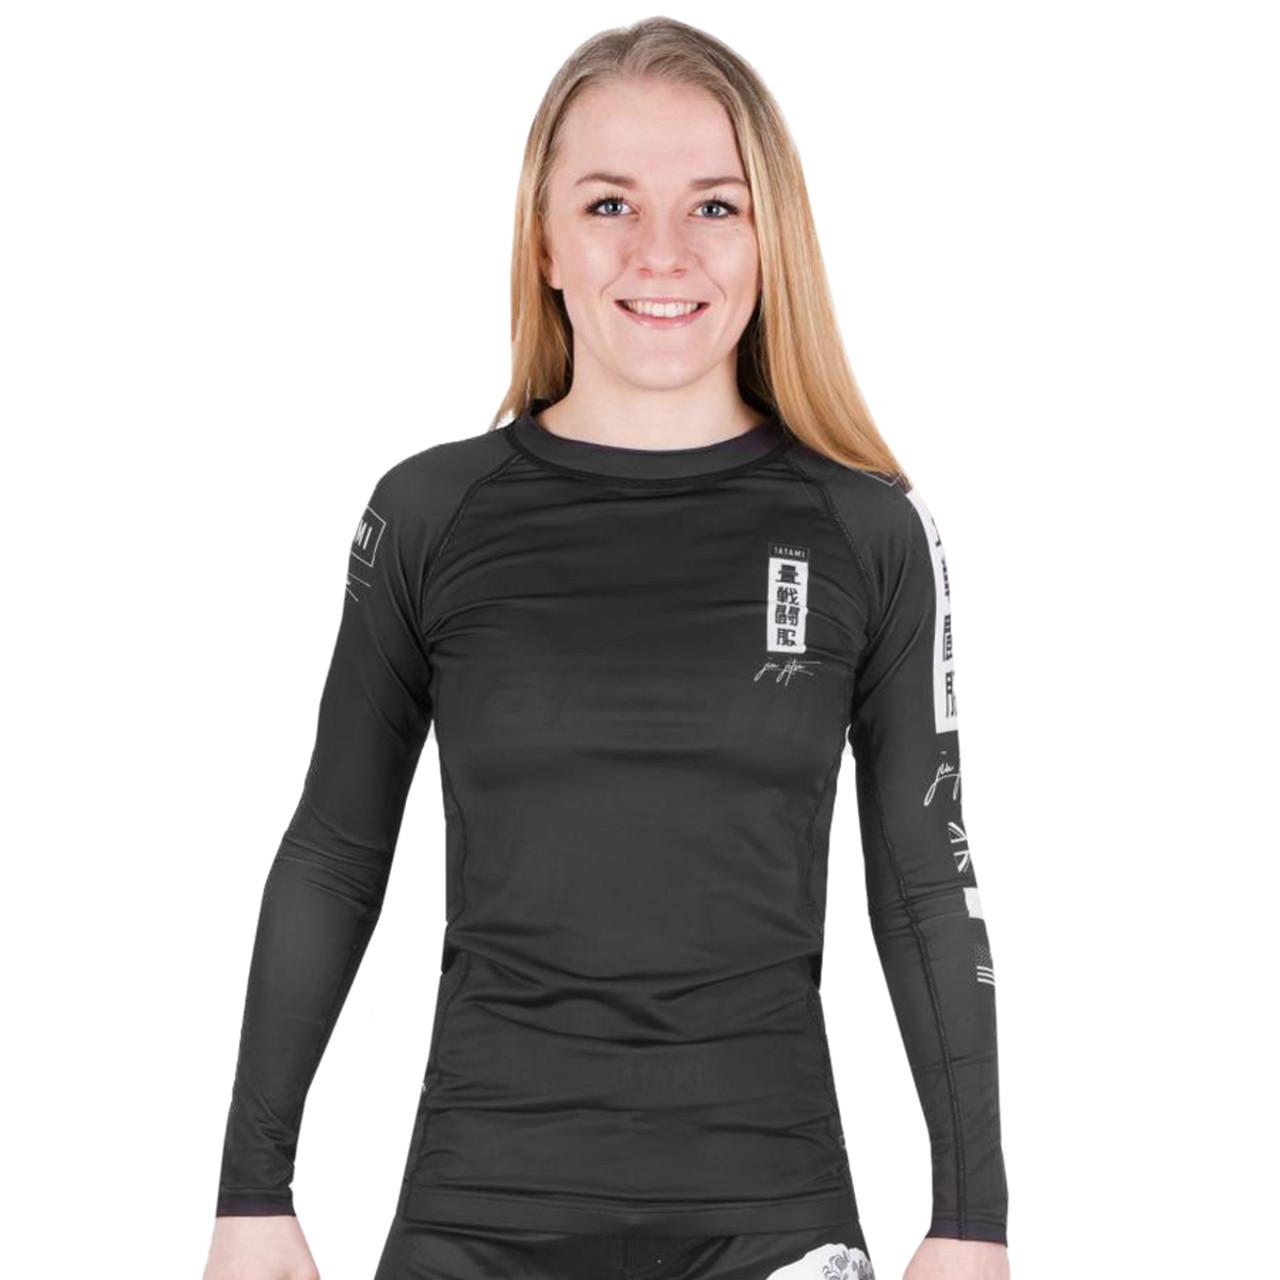 Long Sleeve Tatami Kanagawa Rashguard Black Fitness Grappling and MMA Compression Shirt with 4-Way Stretch for Jiu Jitsu Mens Rash Guard